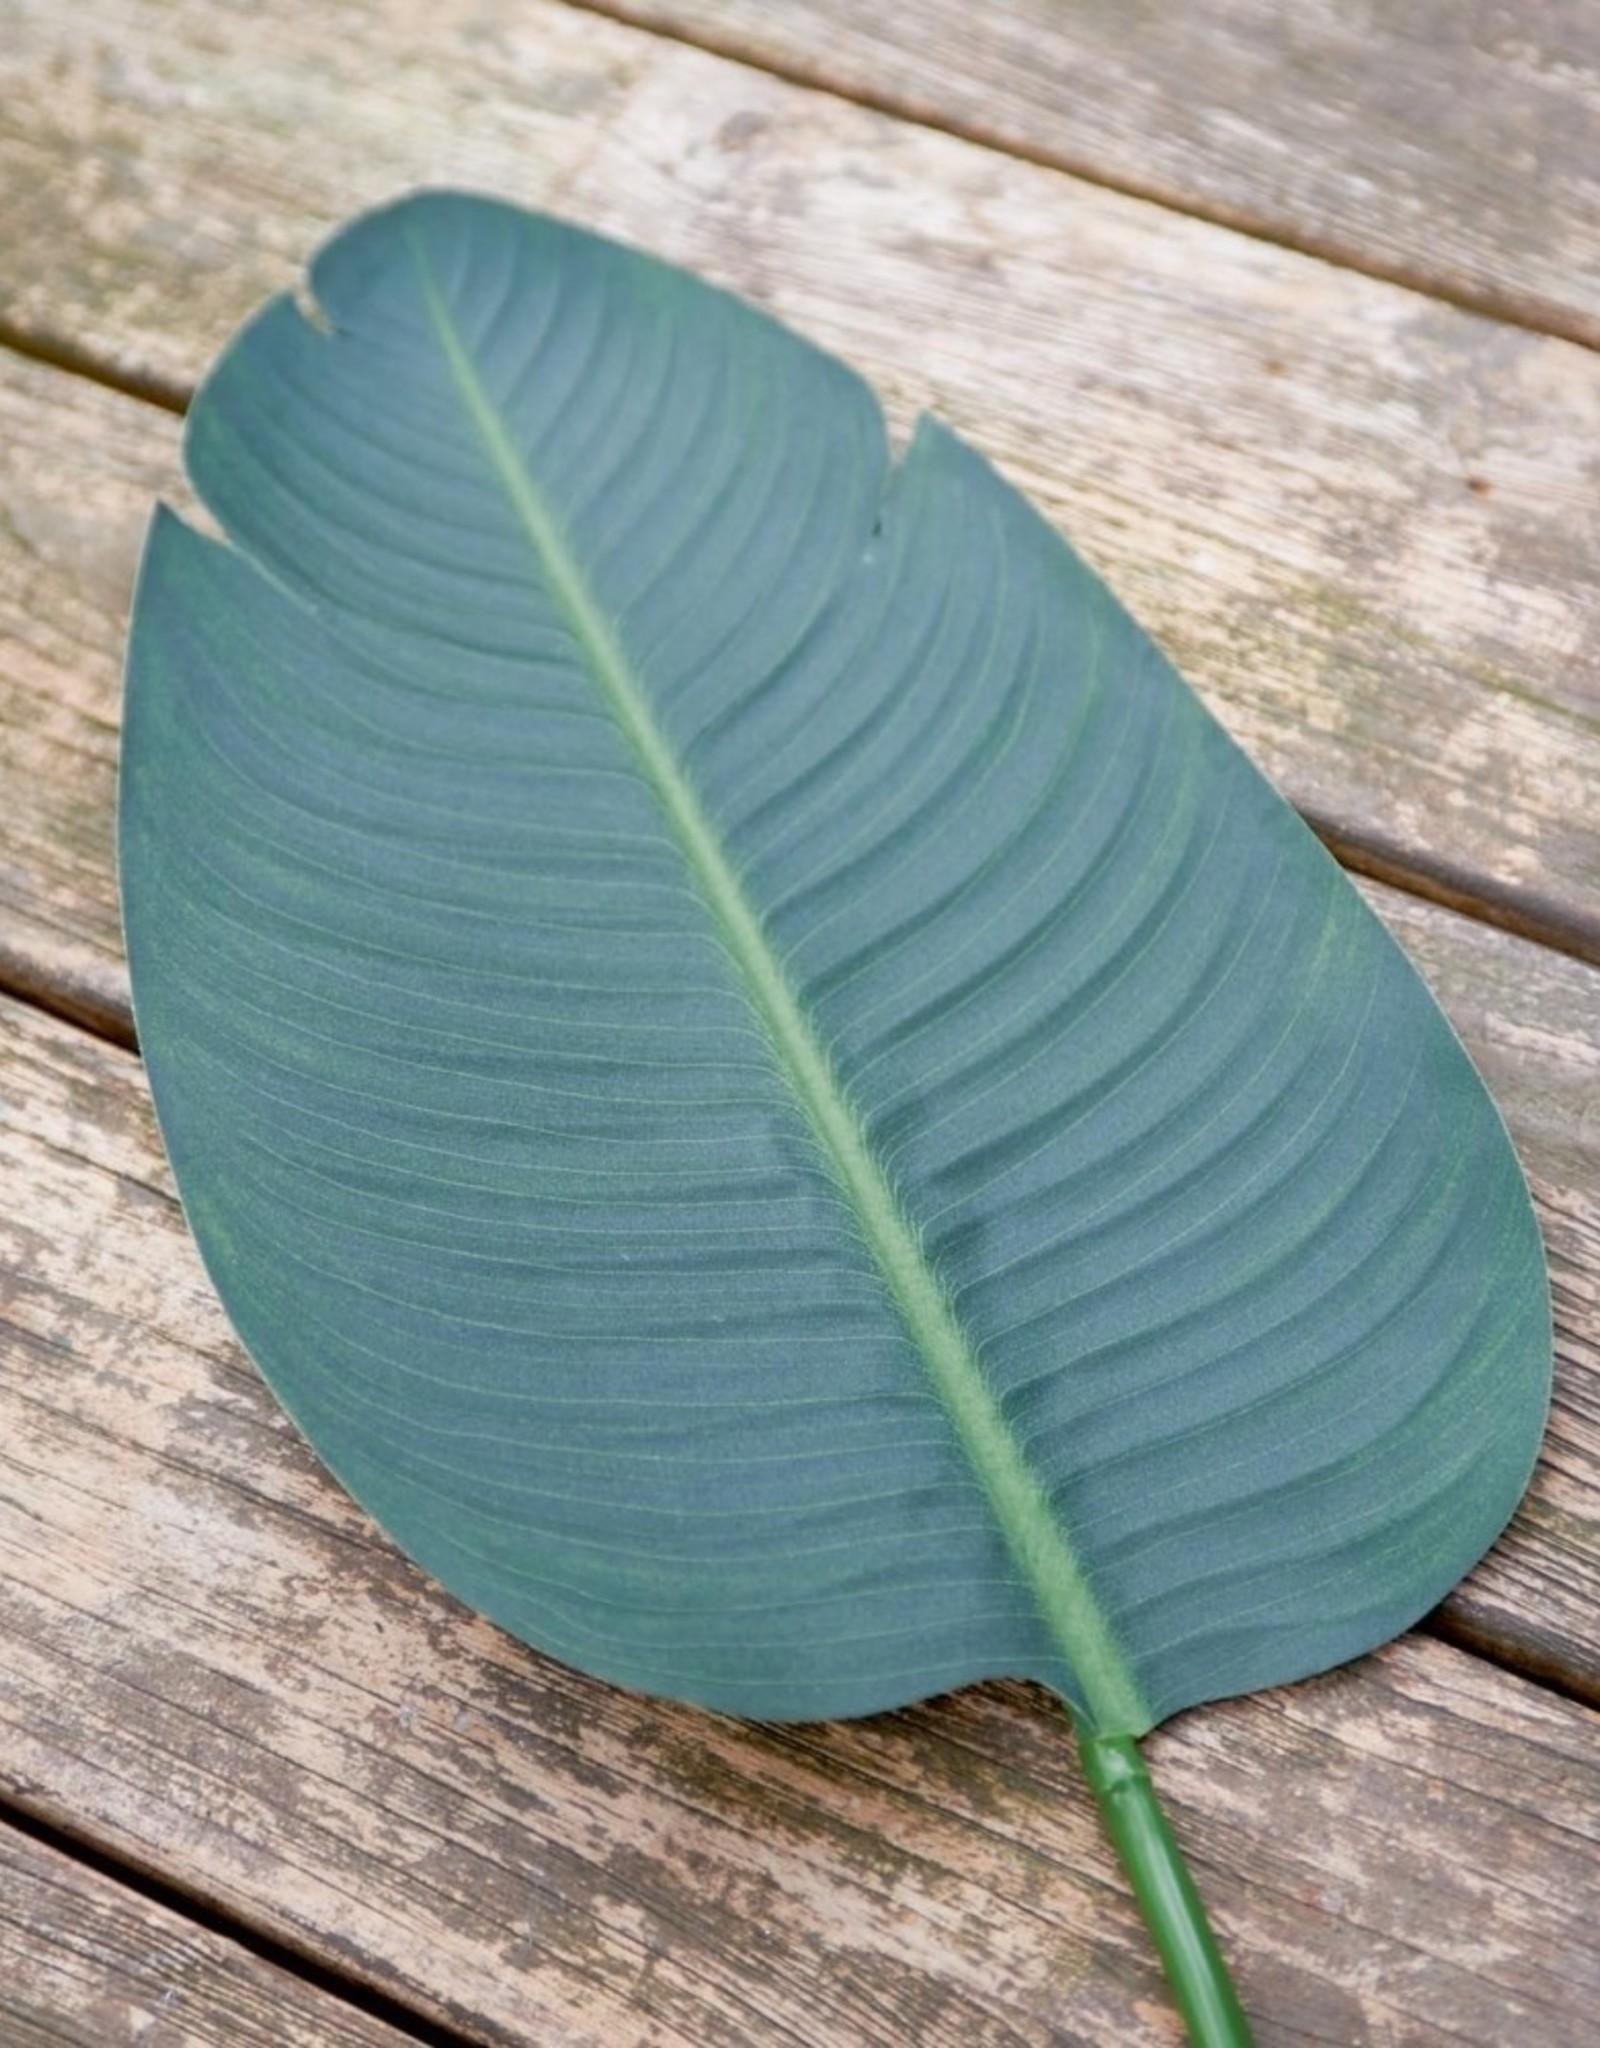 Riviera Maison Strelitzia Leaf L